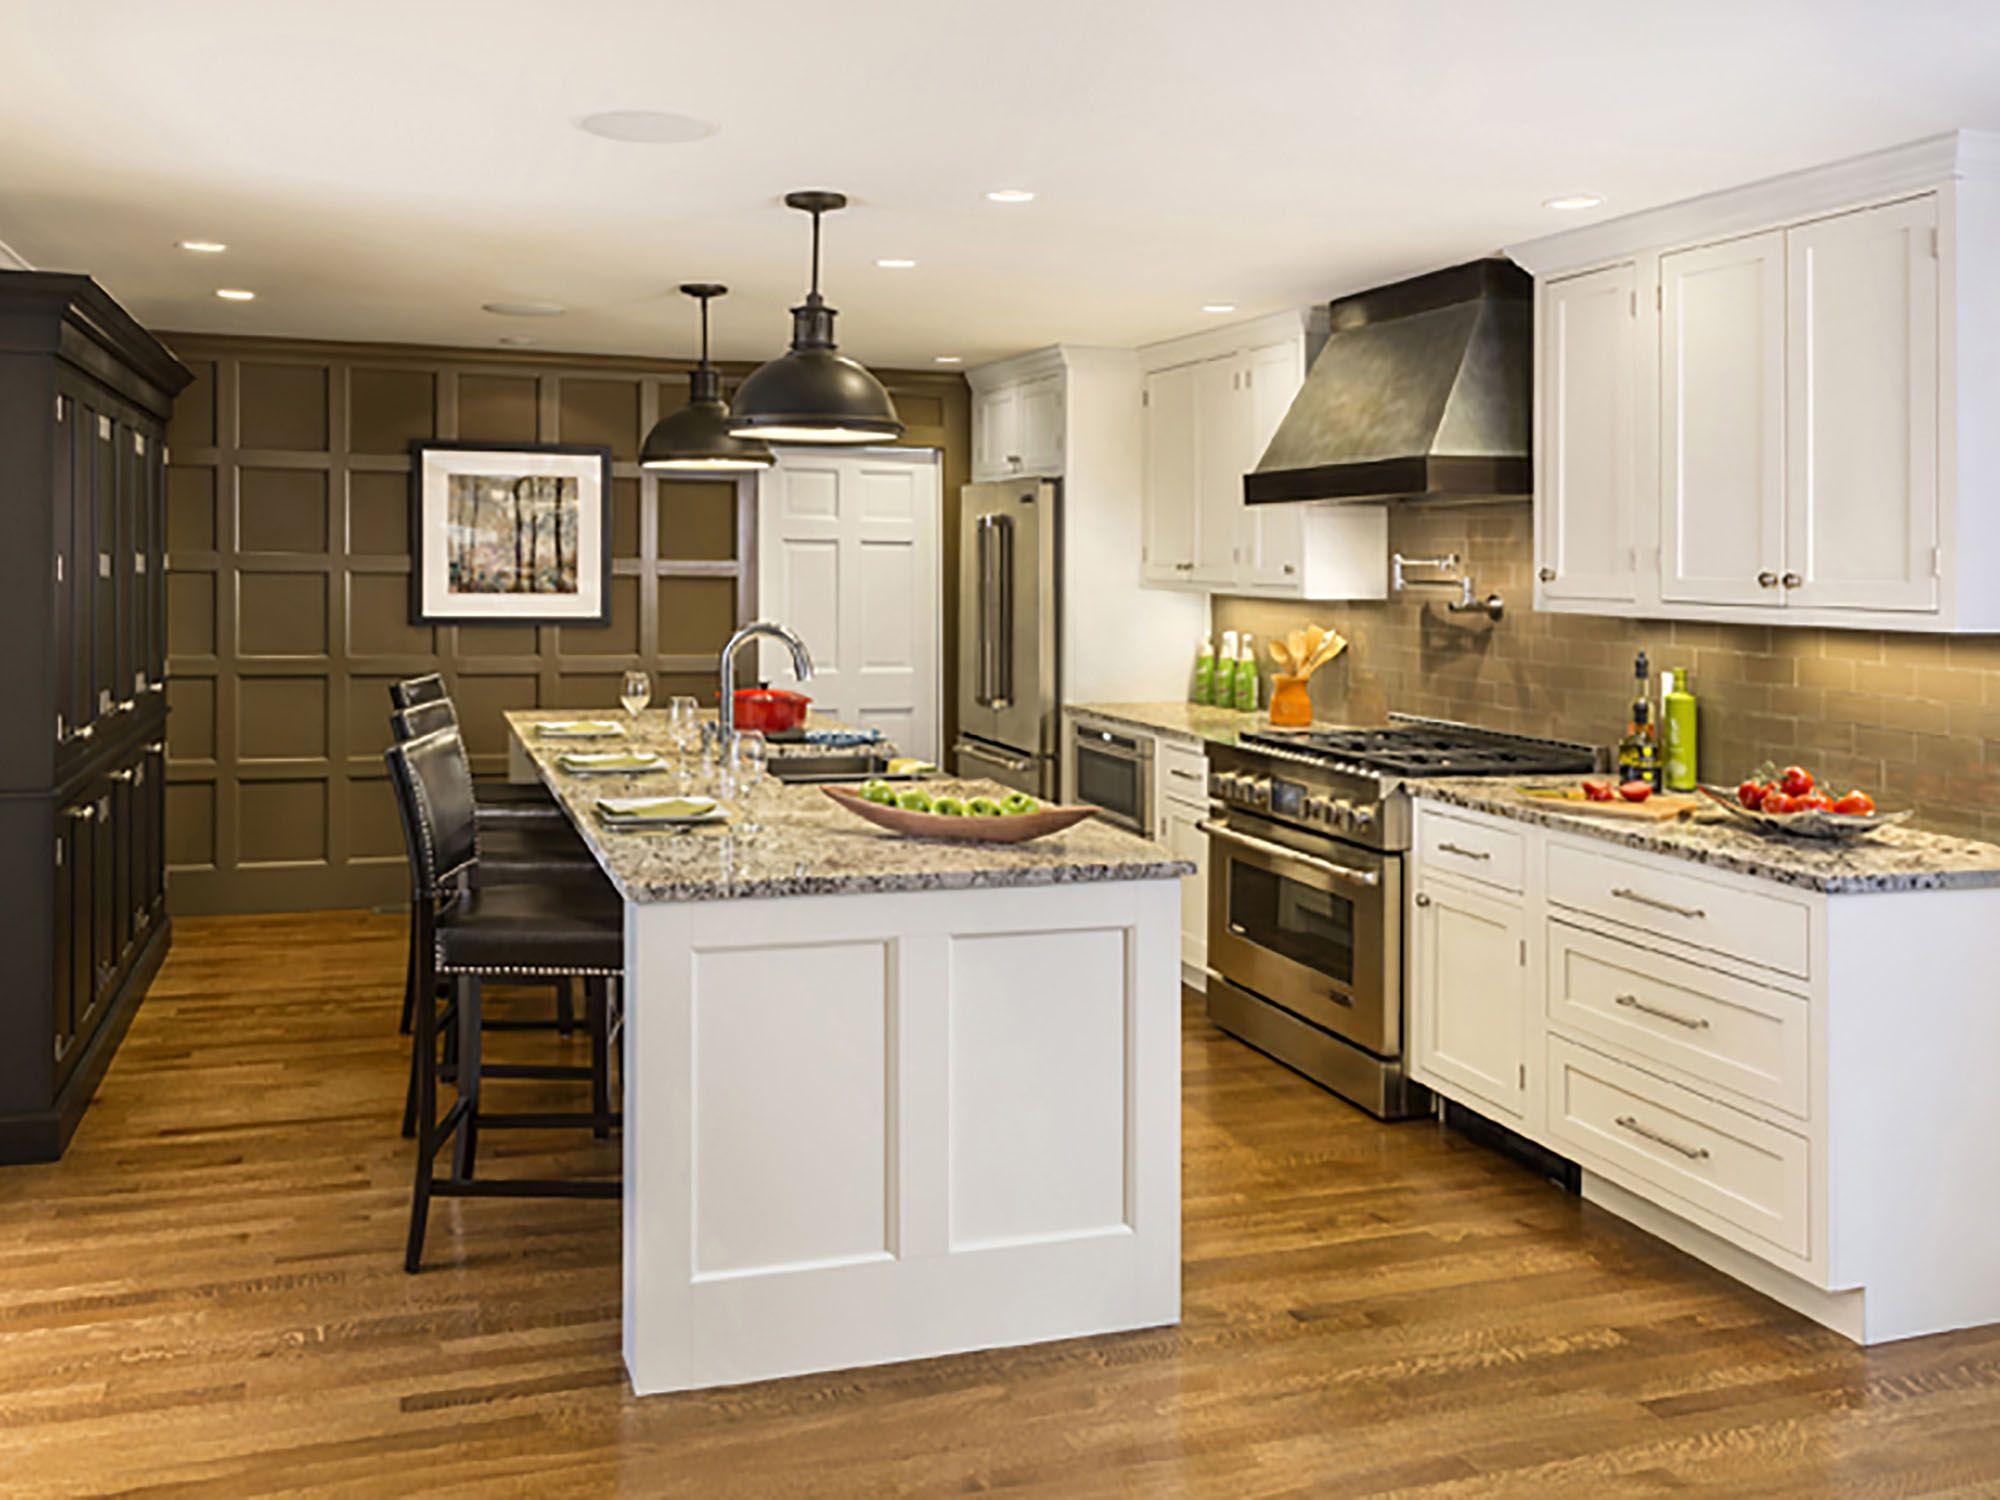 Best Kitchen Remodeling Project Features Cliqstudios Com Inset 640 x 480